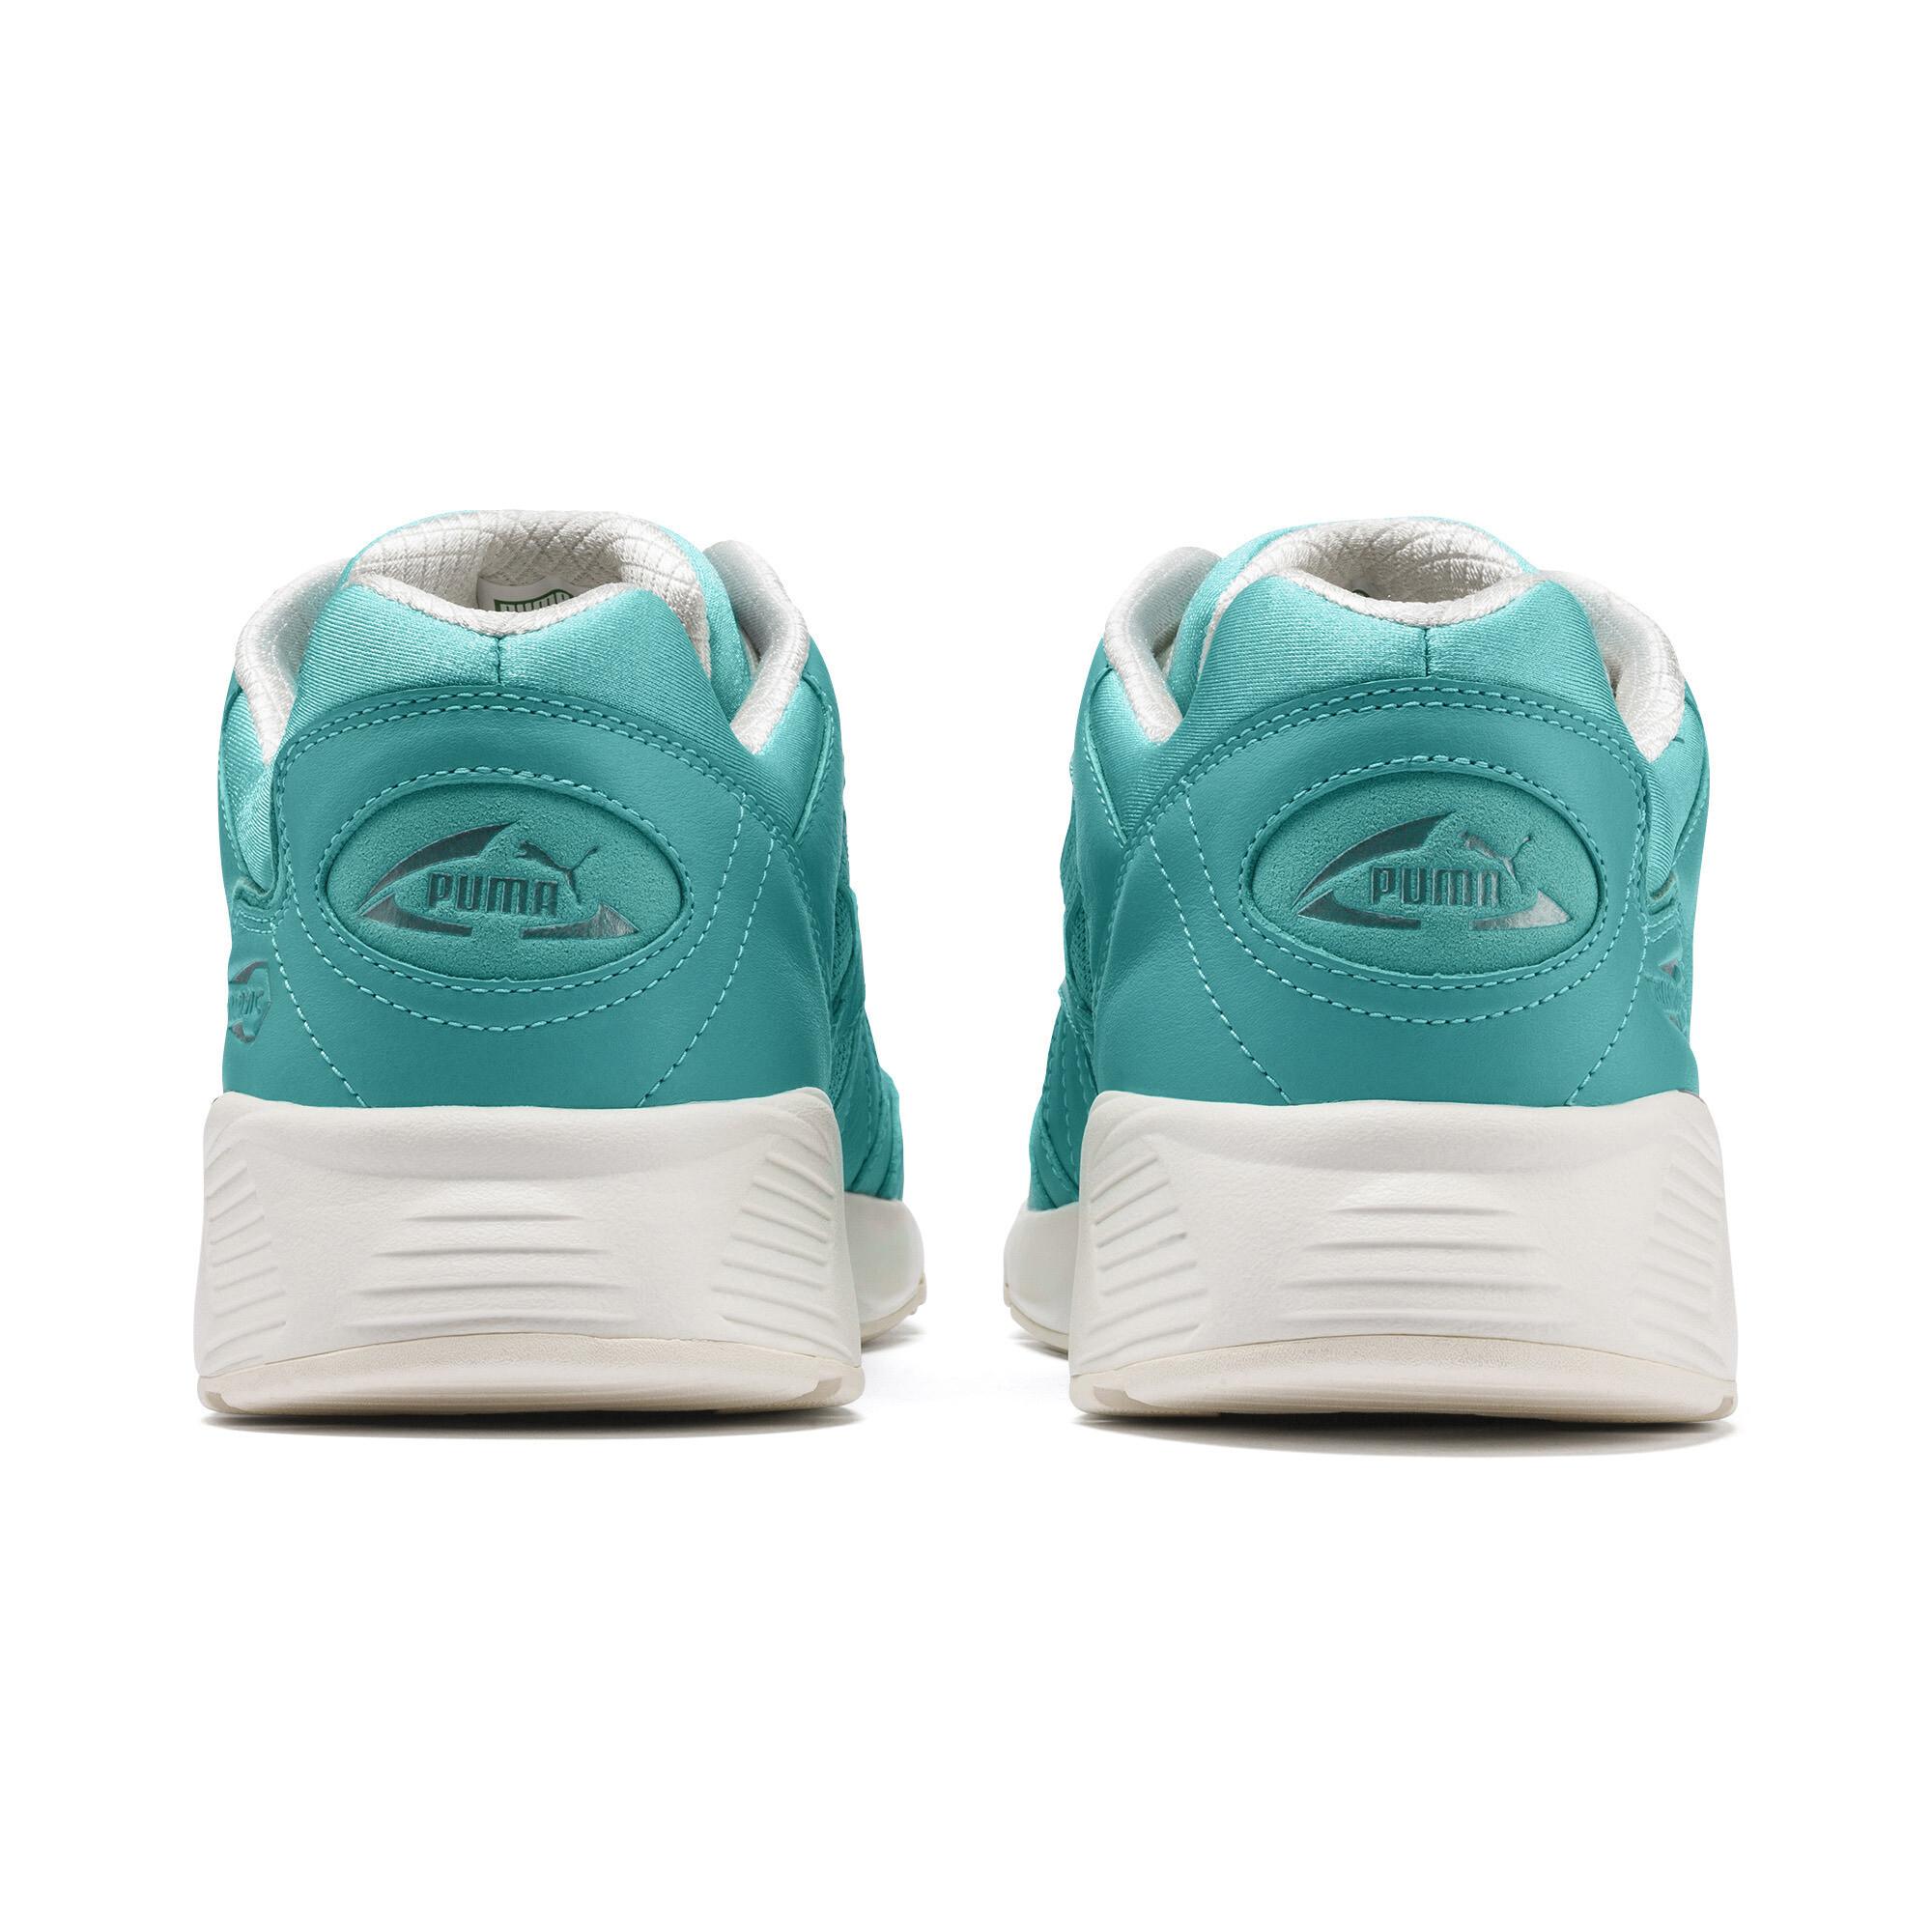 PUMA-Prevail-IR-Reality-Sneakers-Unisex-Shoe thumbnail 3